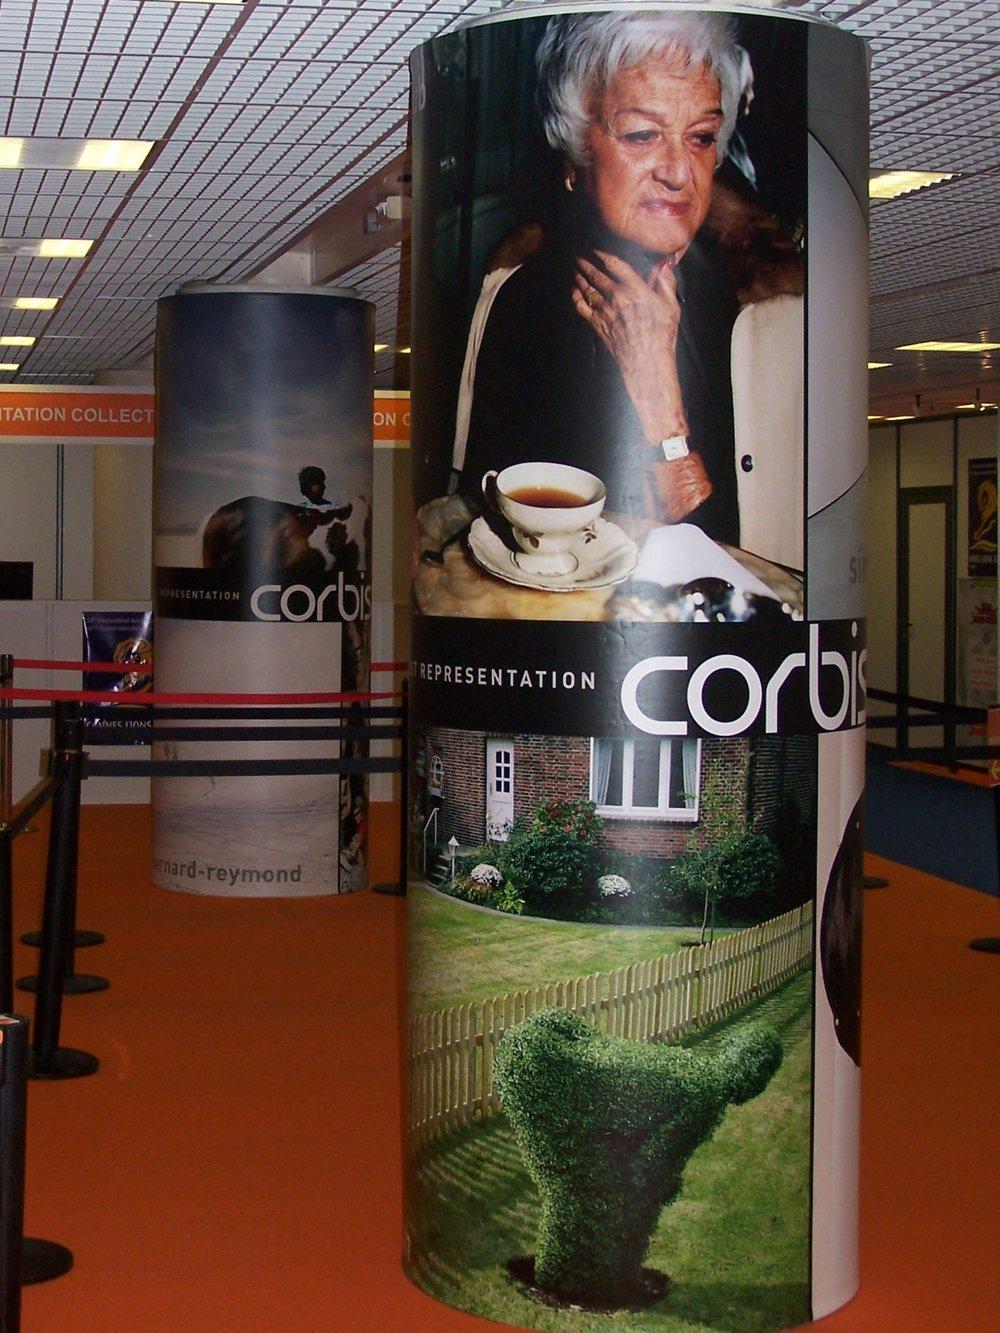 Corb_Cann3.JPG